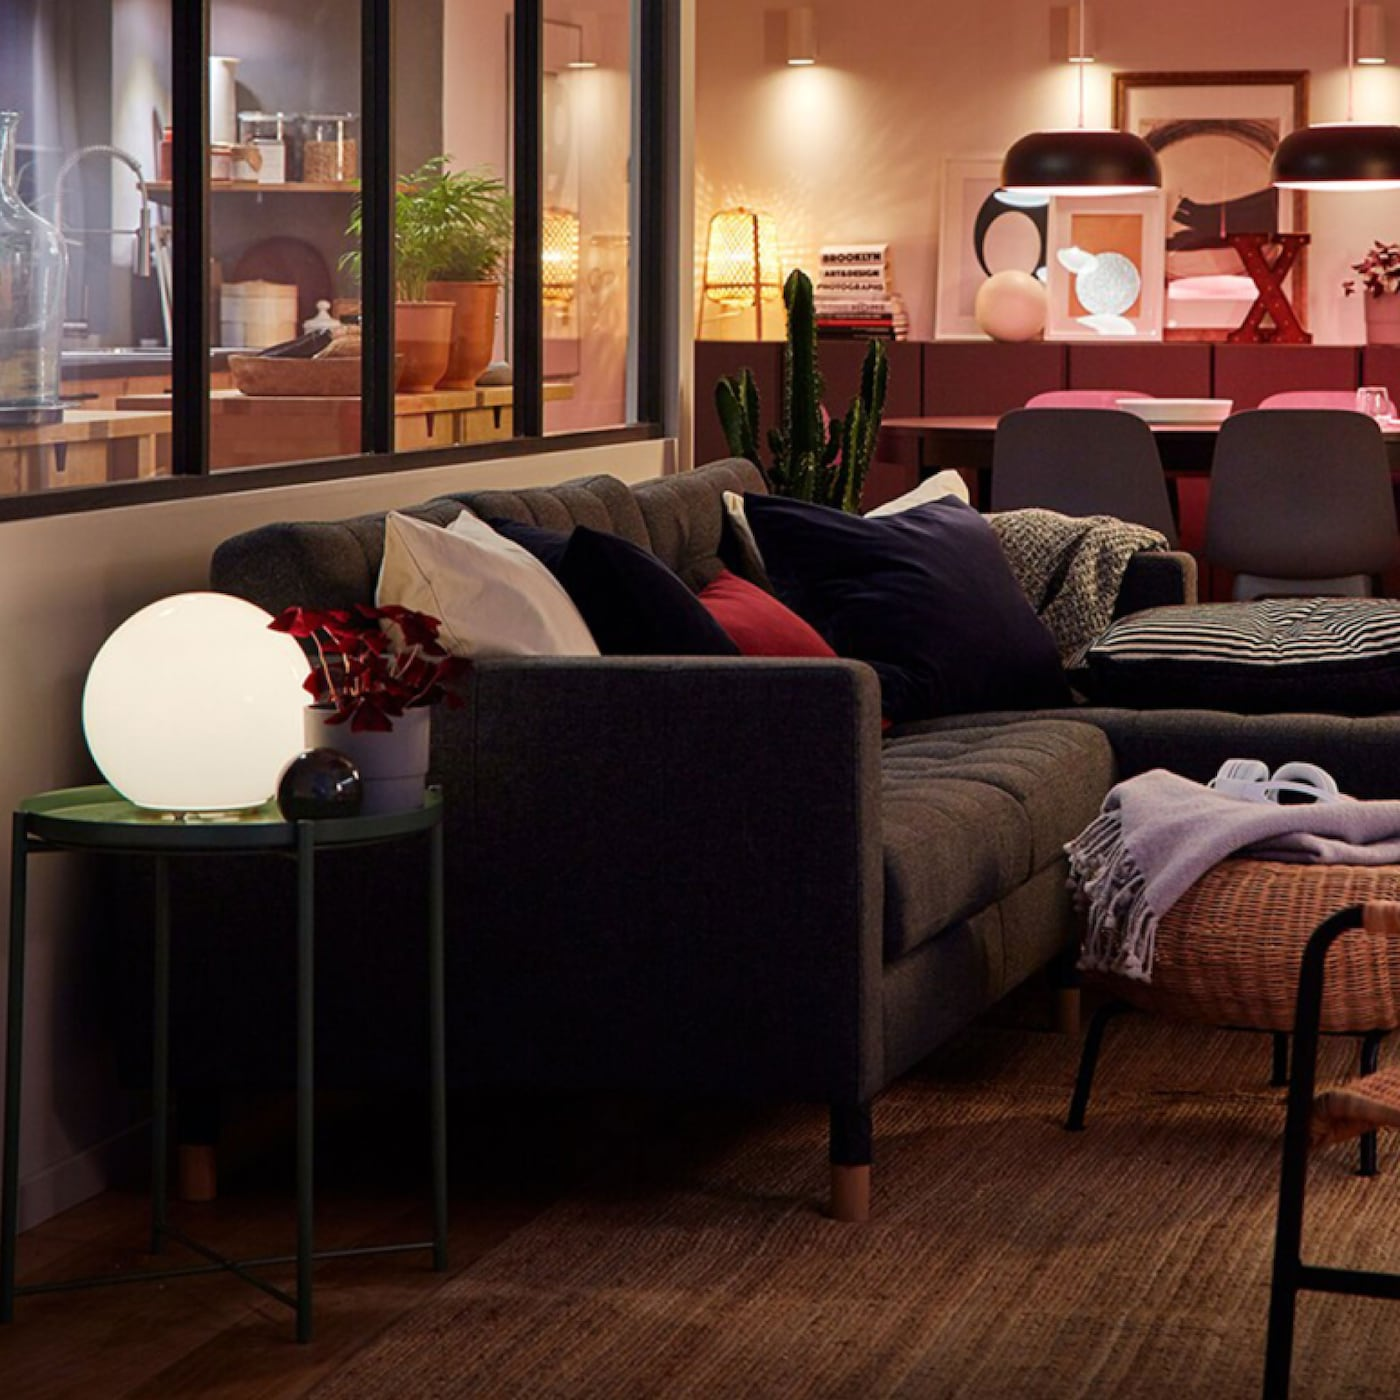 IKEA Home smart system